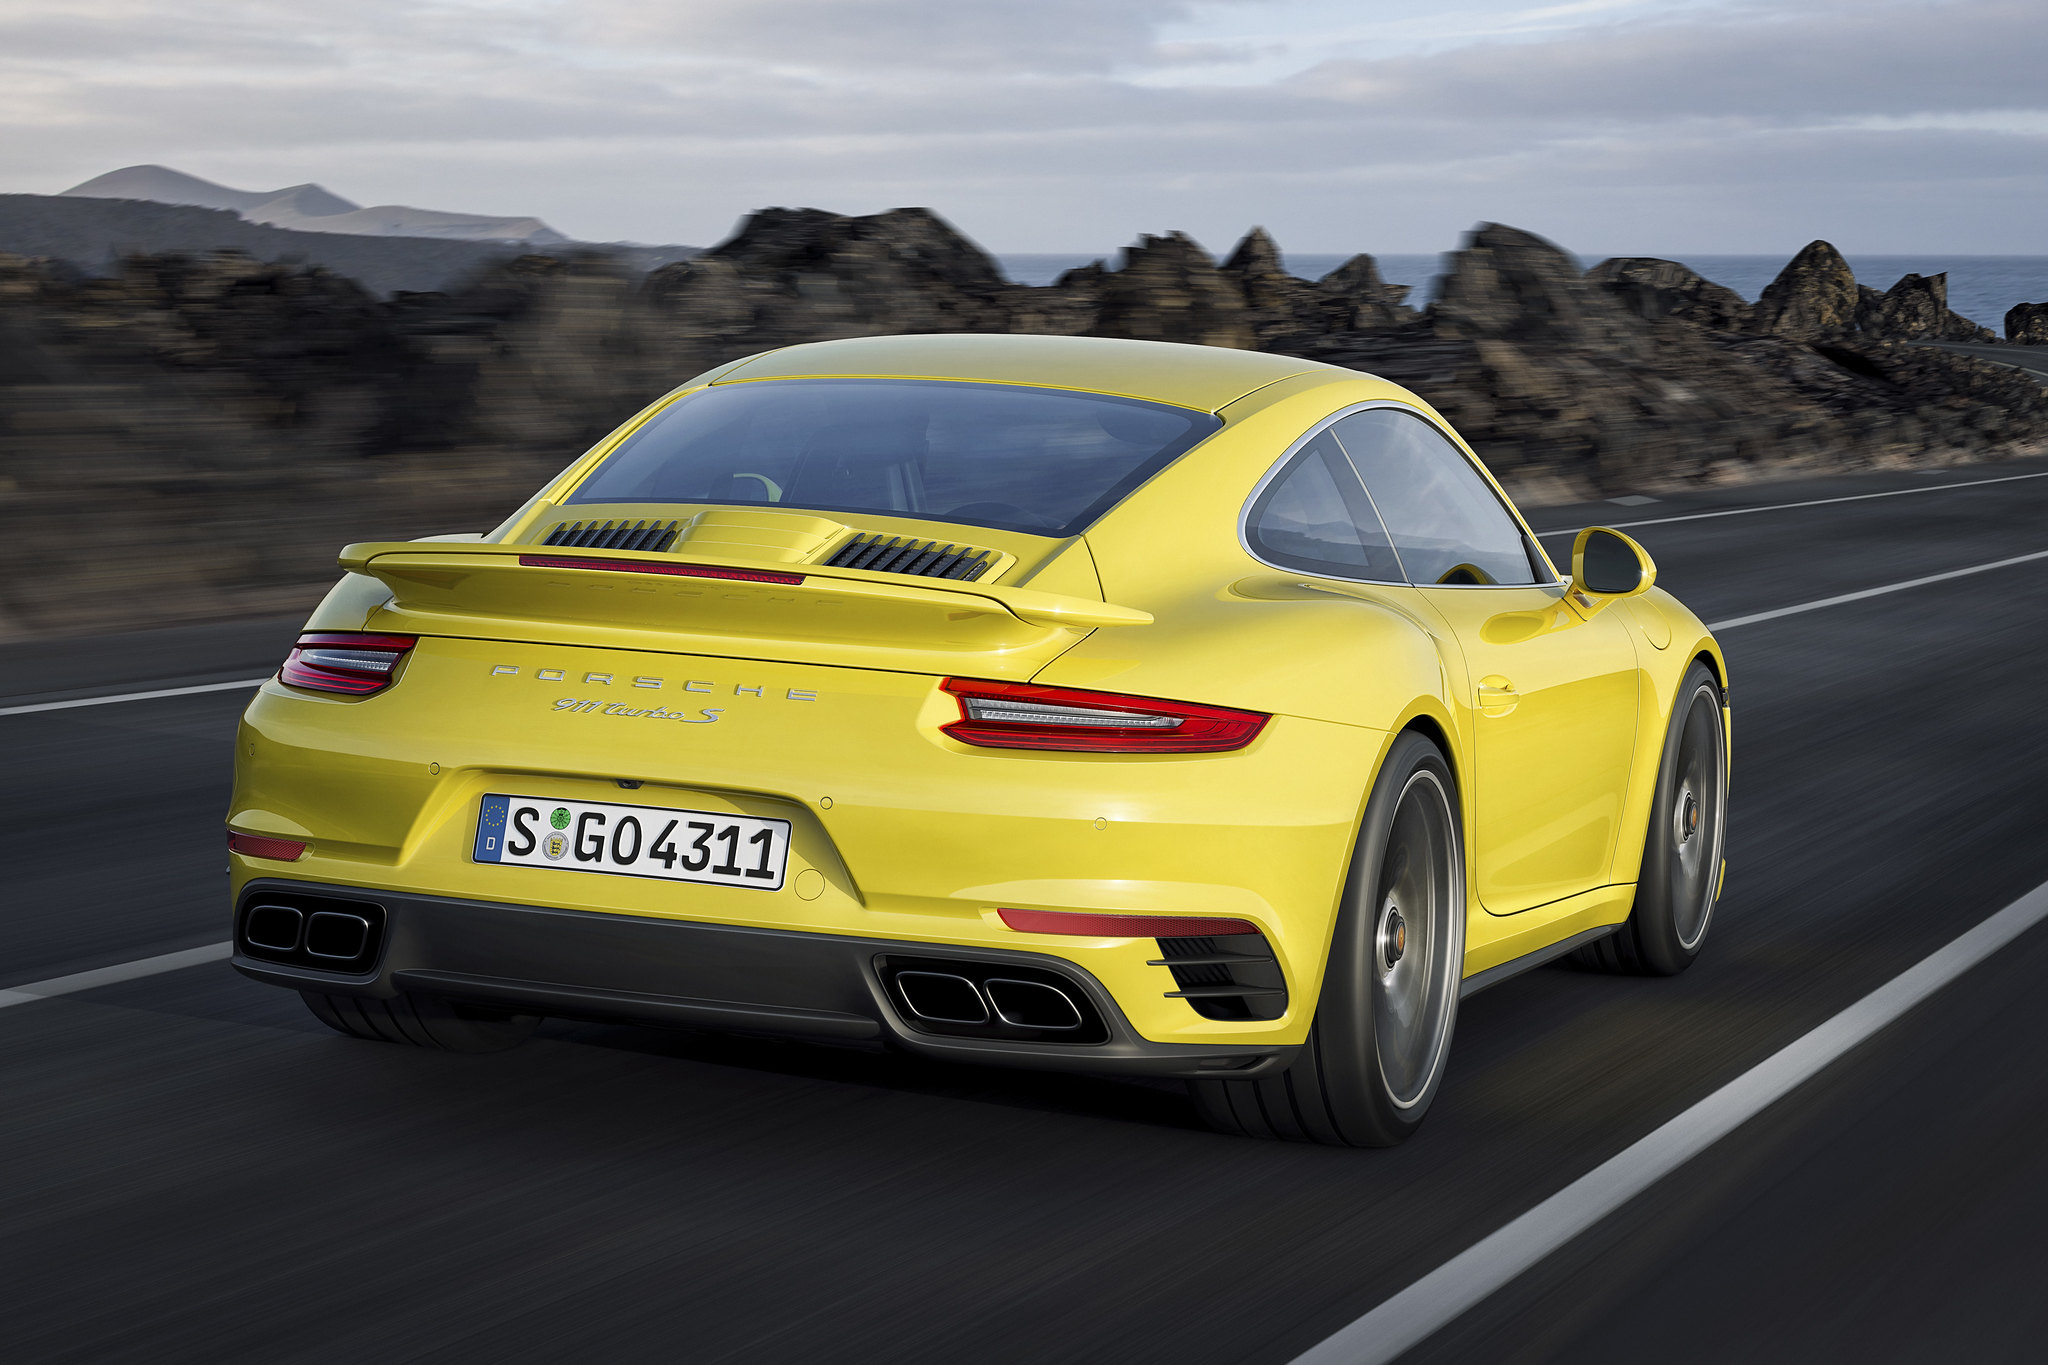 The new 2017 Porsche 911 Turbo and 911 Turbo S